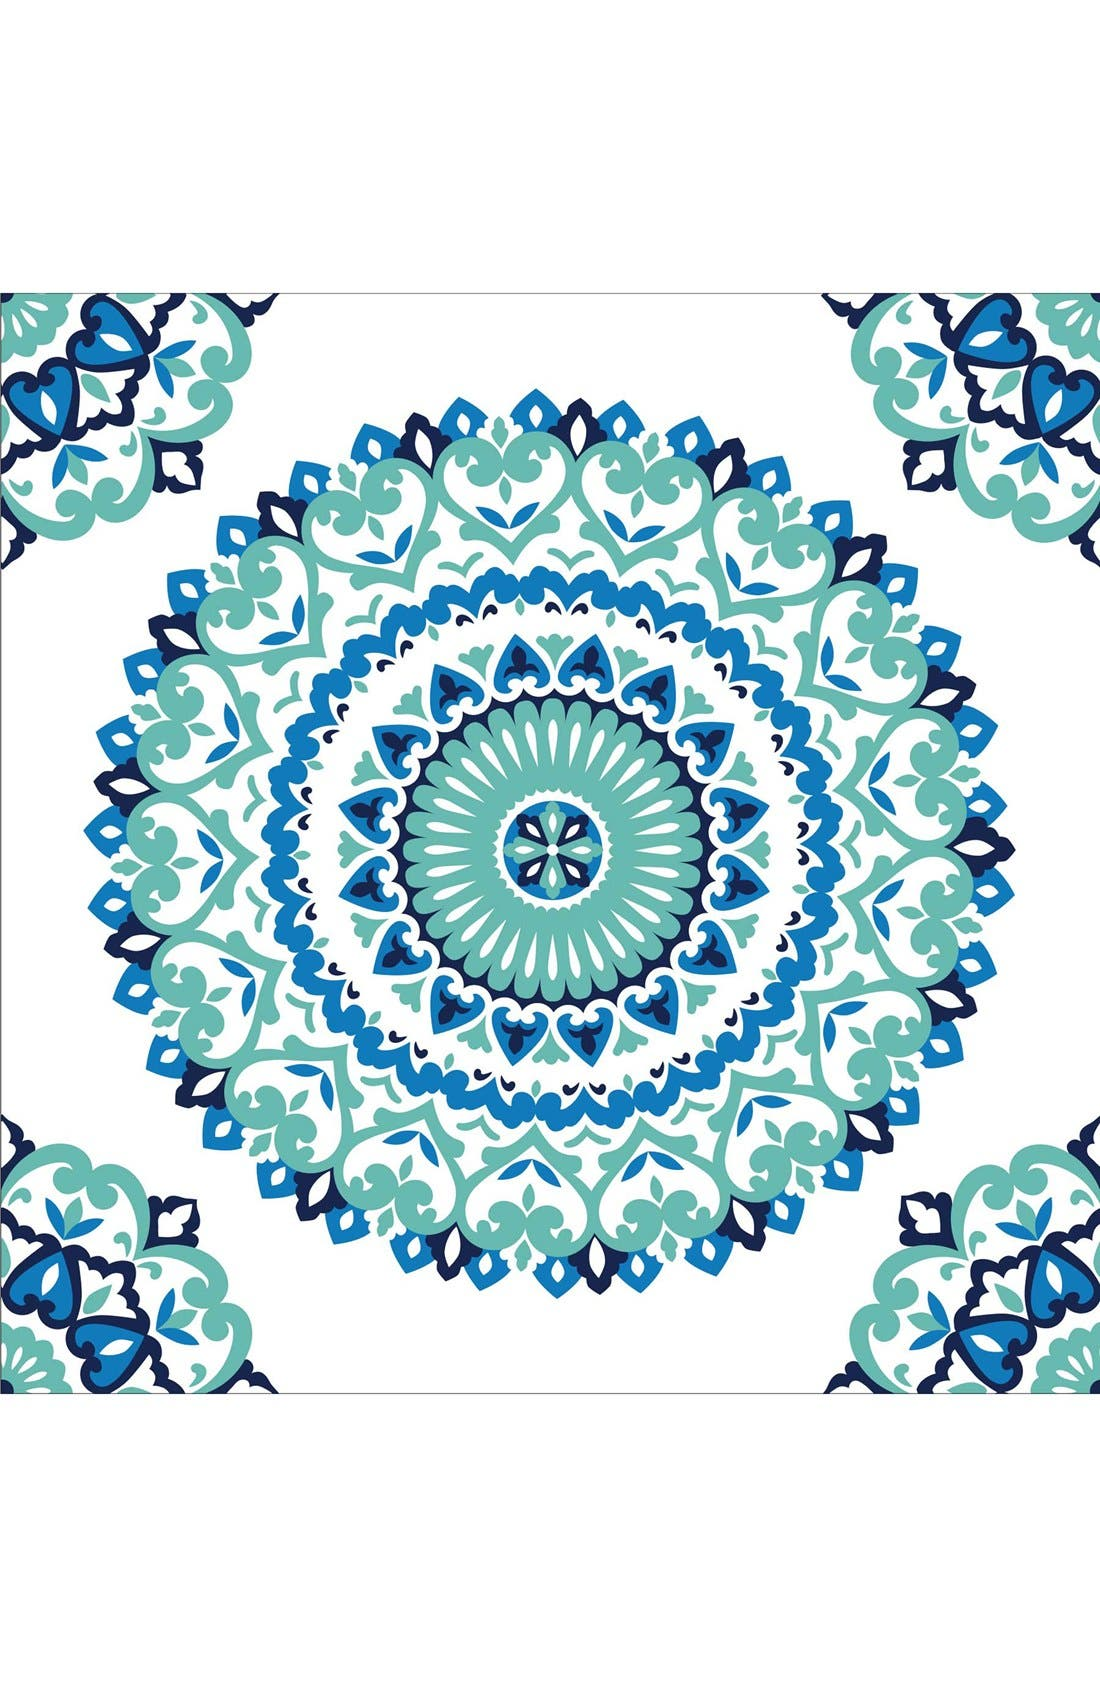 Alternate Image 1 Selected - Wallpops 'Jasmine Medallion' Reusable Peel & Stick Vinyl Wallpaper